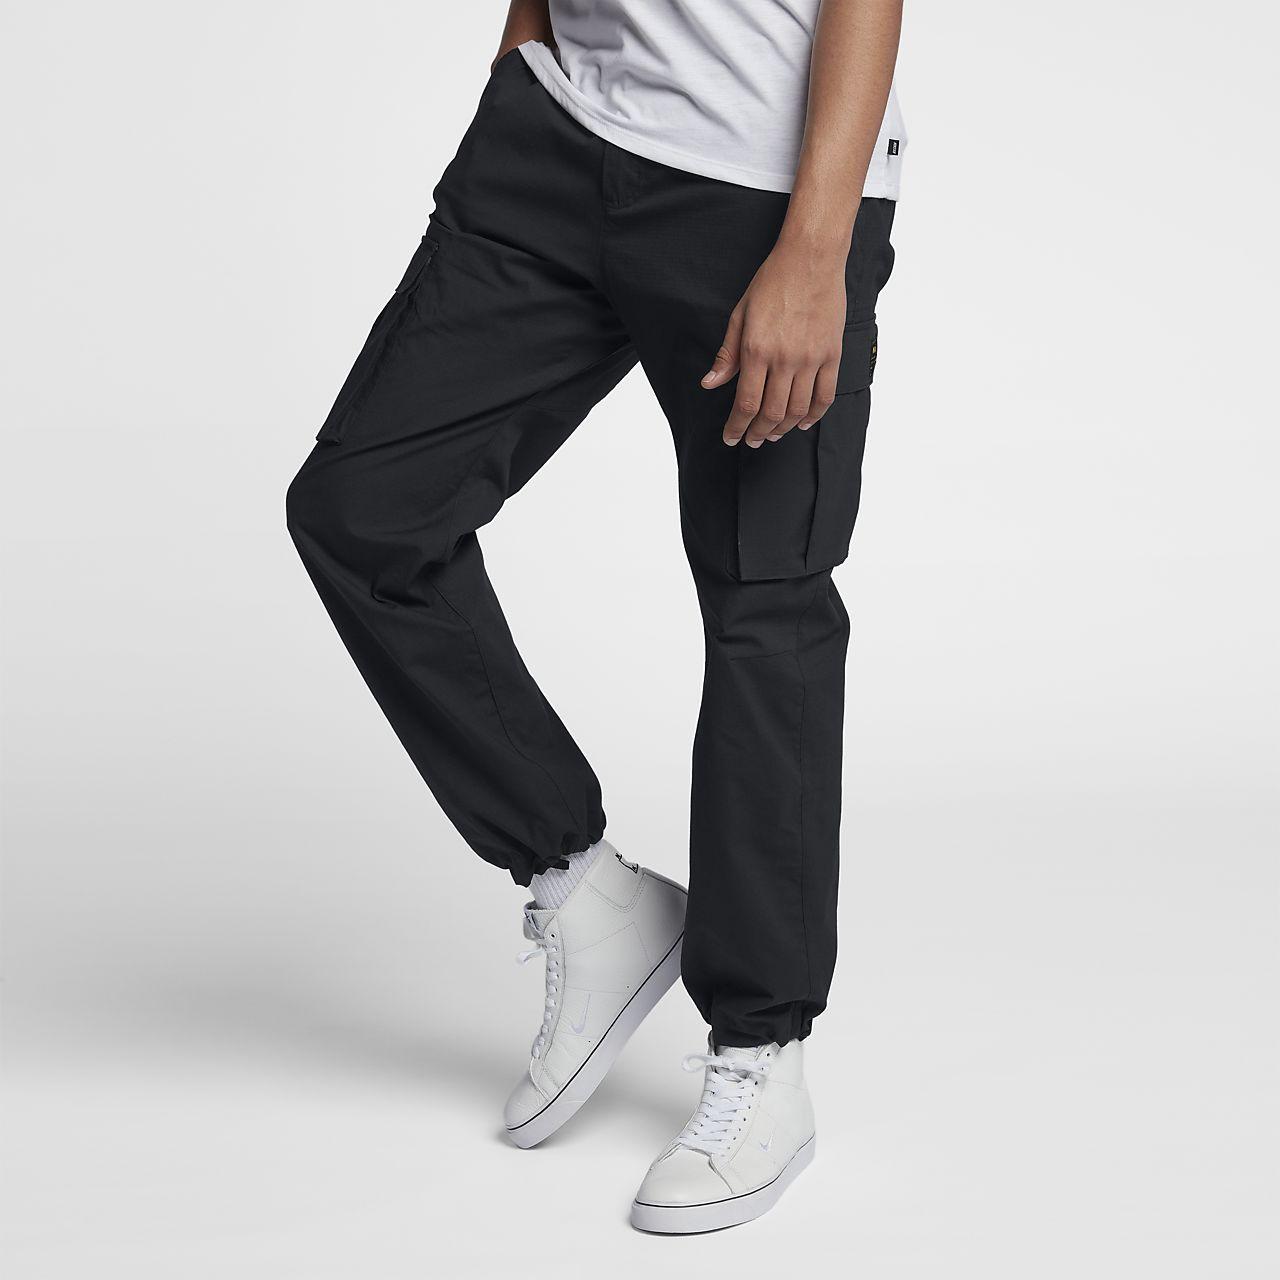 Nike Sb Flex Ftm Men S Skate Cargo Pants Nike Com Cargo Pants Men Cargo Pants Outfit Nike Sb